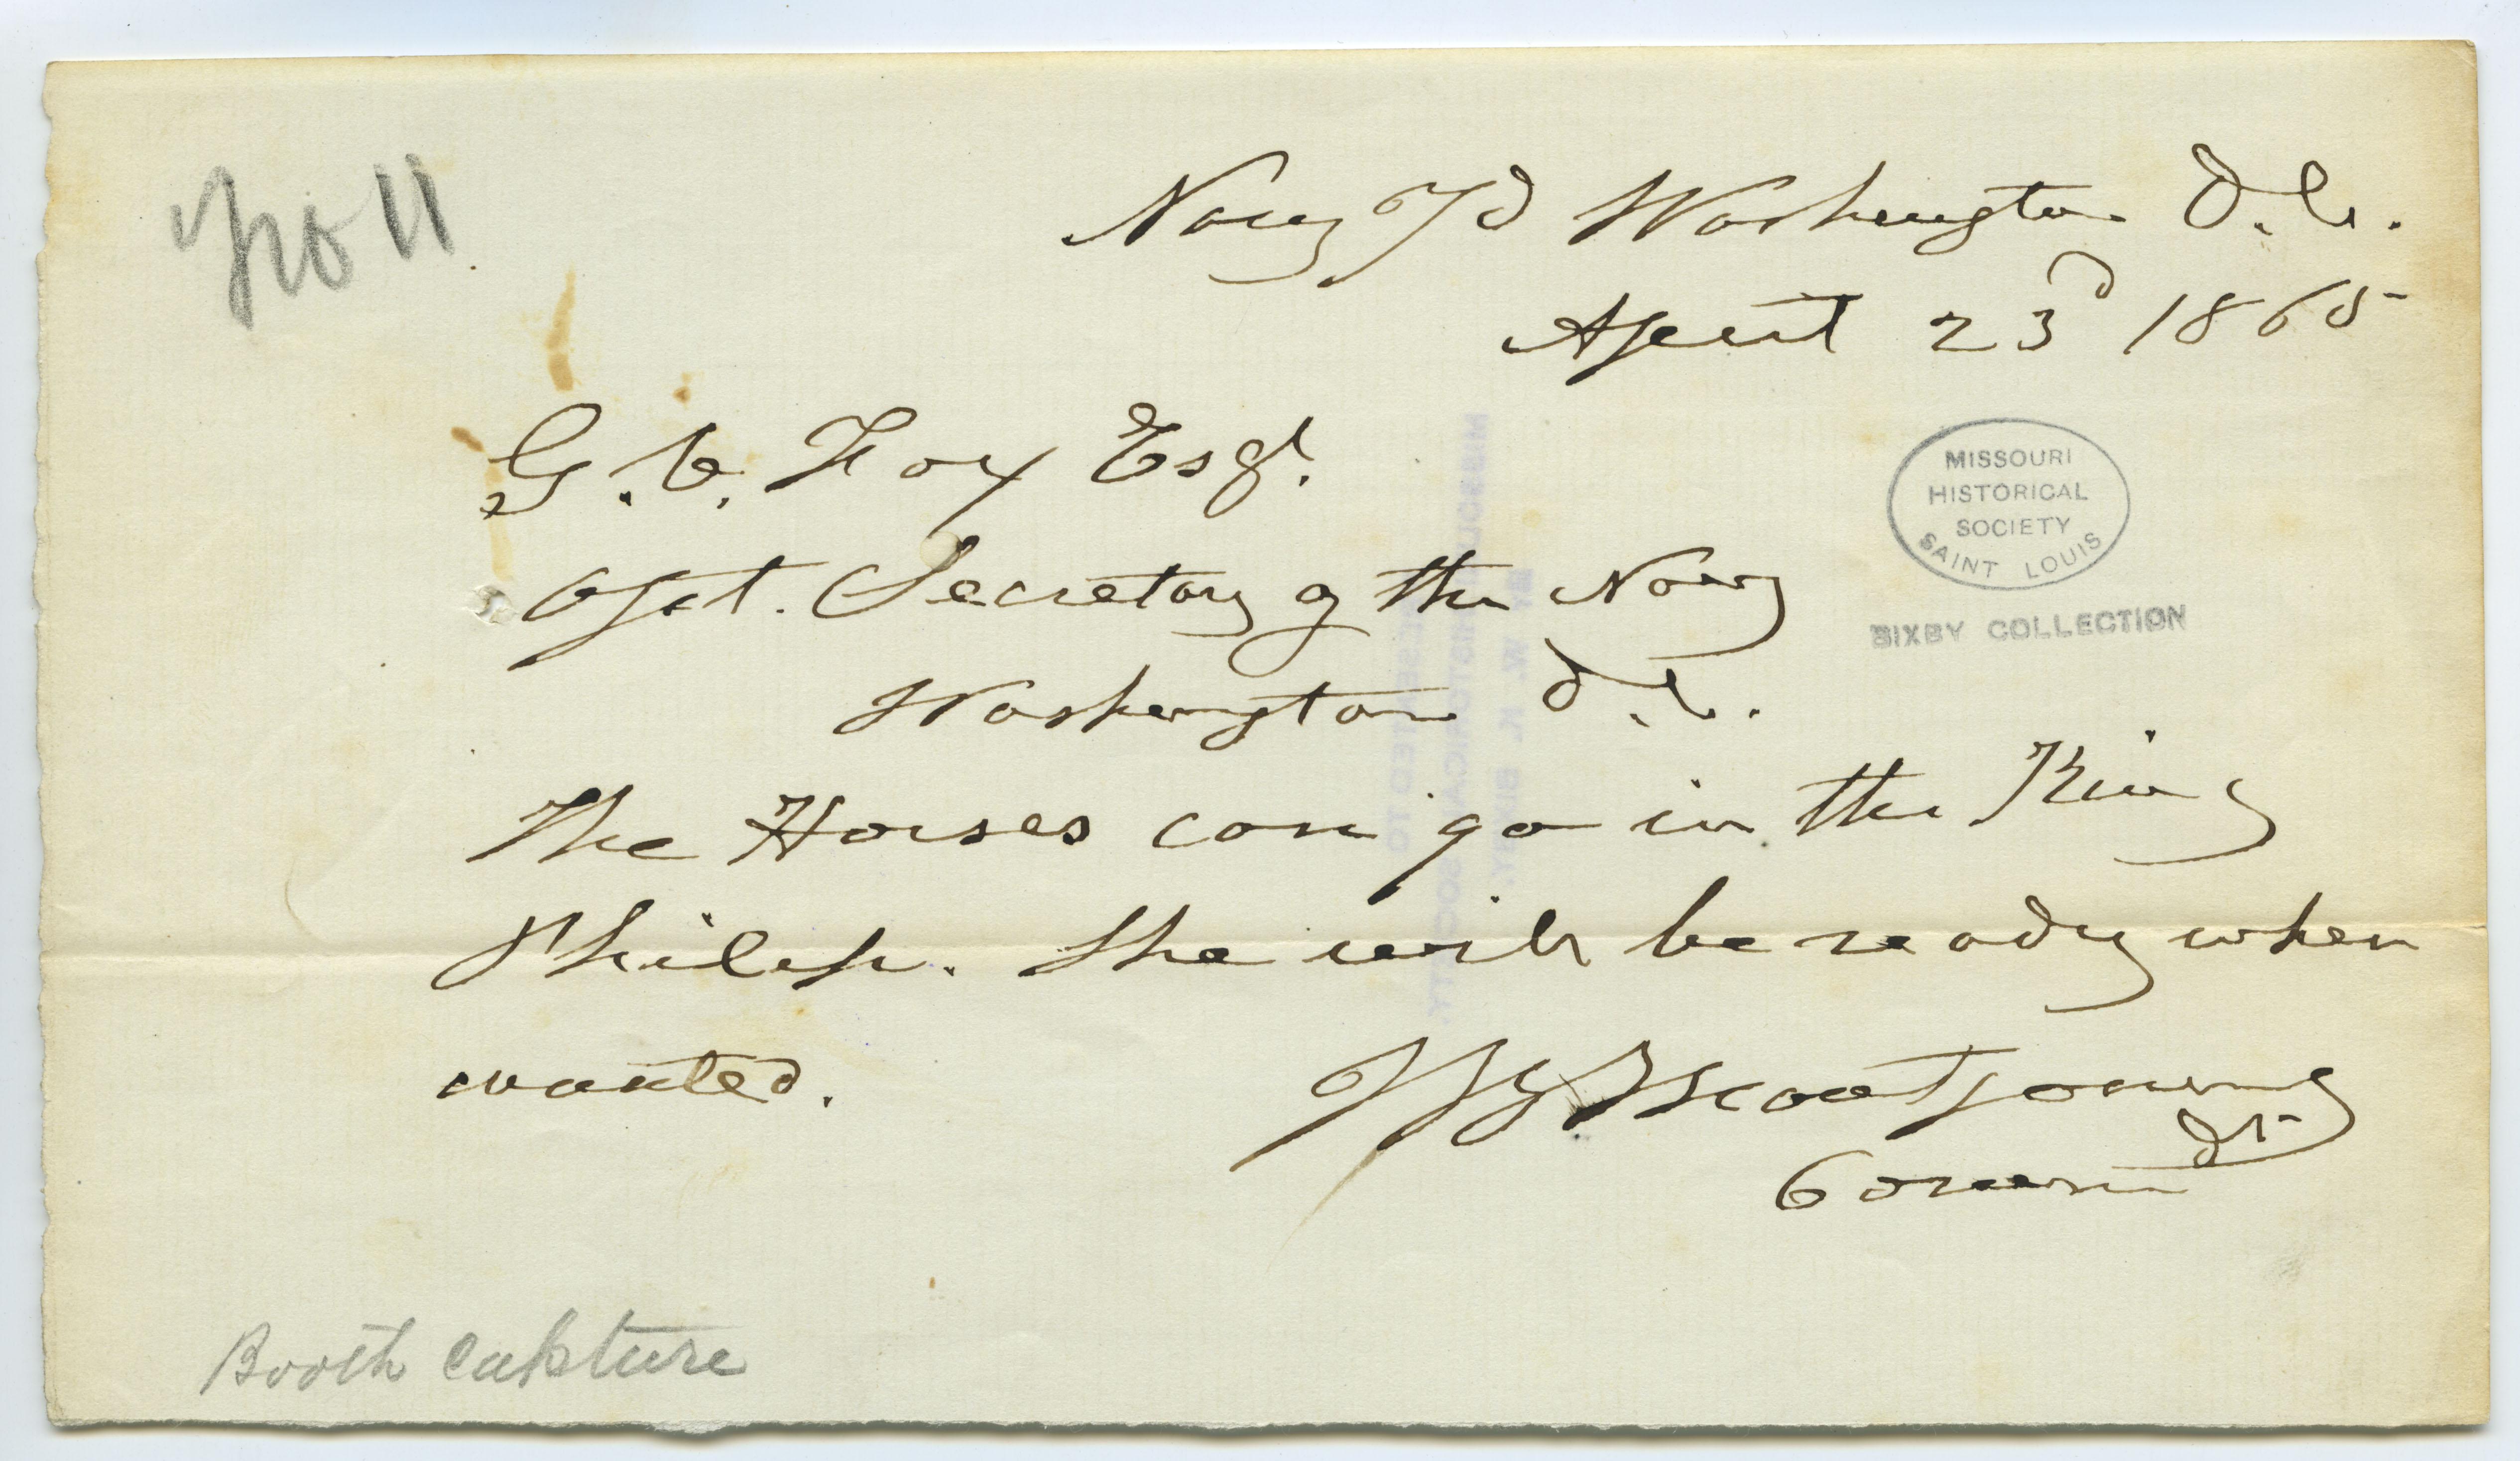 Contemporary copy of telegram of J.B. Montgomery, Navy Yard, Washington, D.C., to G.V. Fox Esq., Asst. Secretary of the Navy, Washington, D.C., April 23, 1865